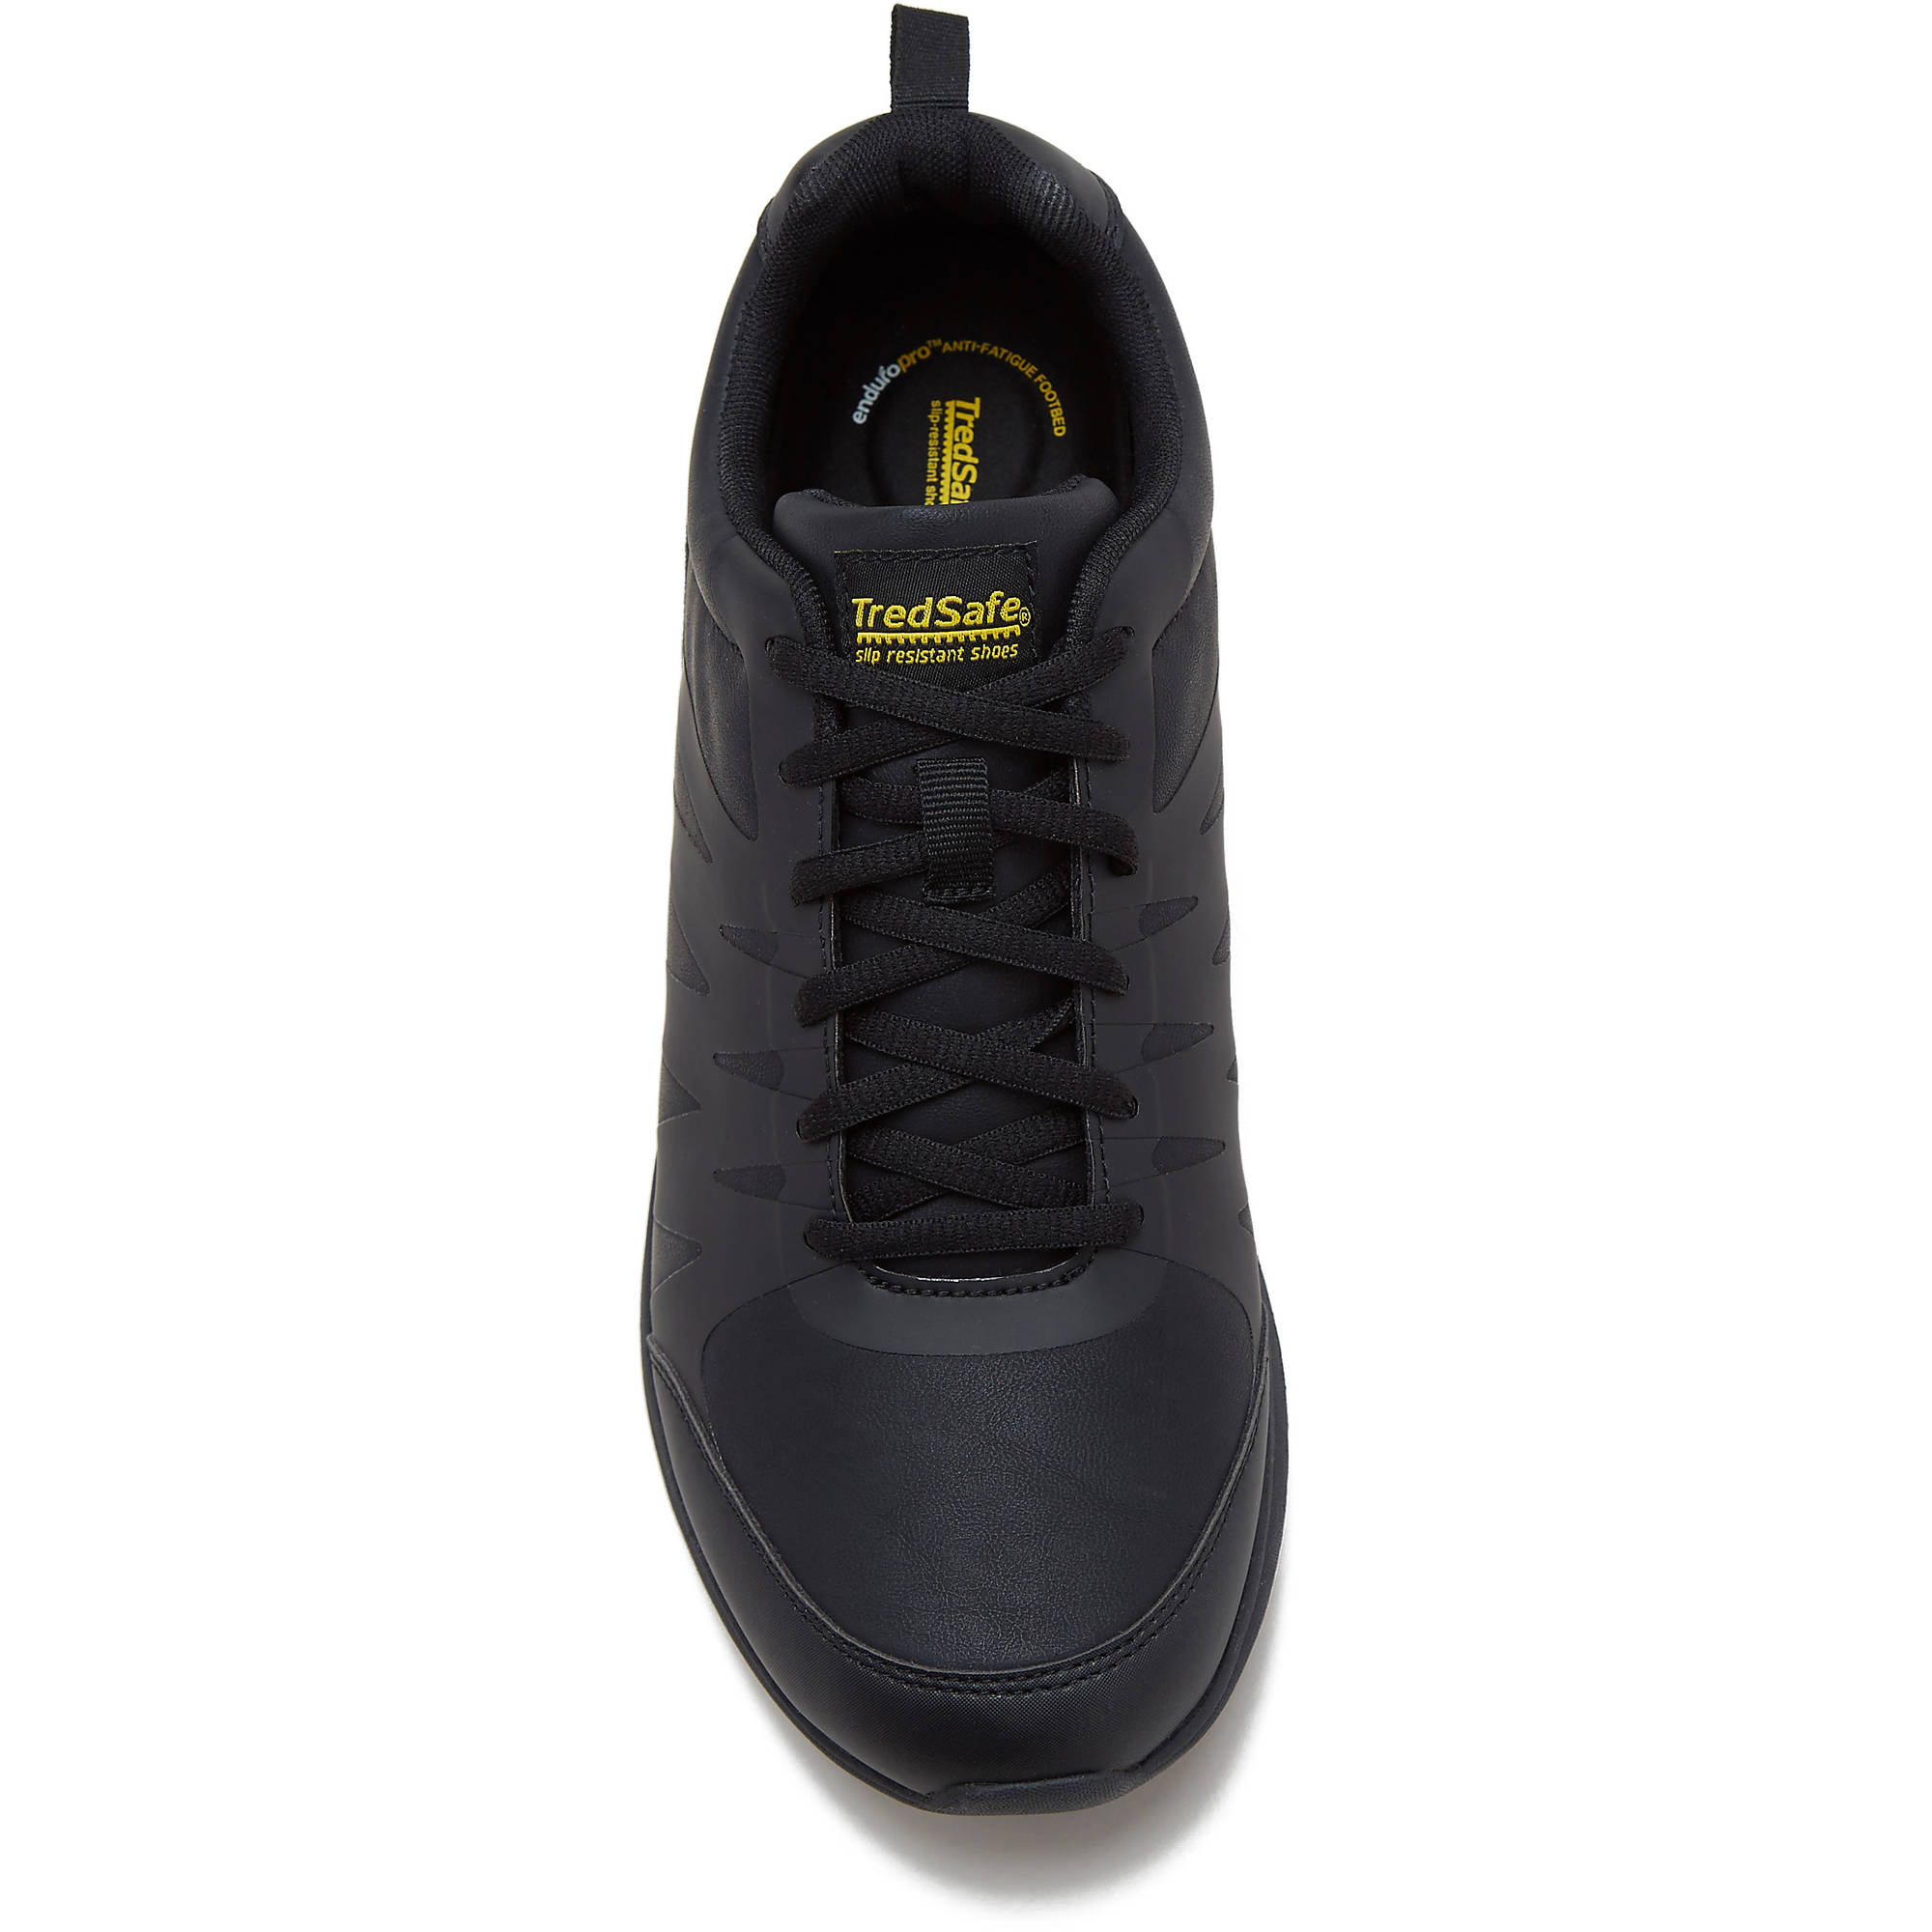 Nitro Slip Resistant Shoe - Walmart.com